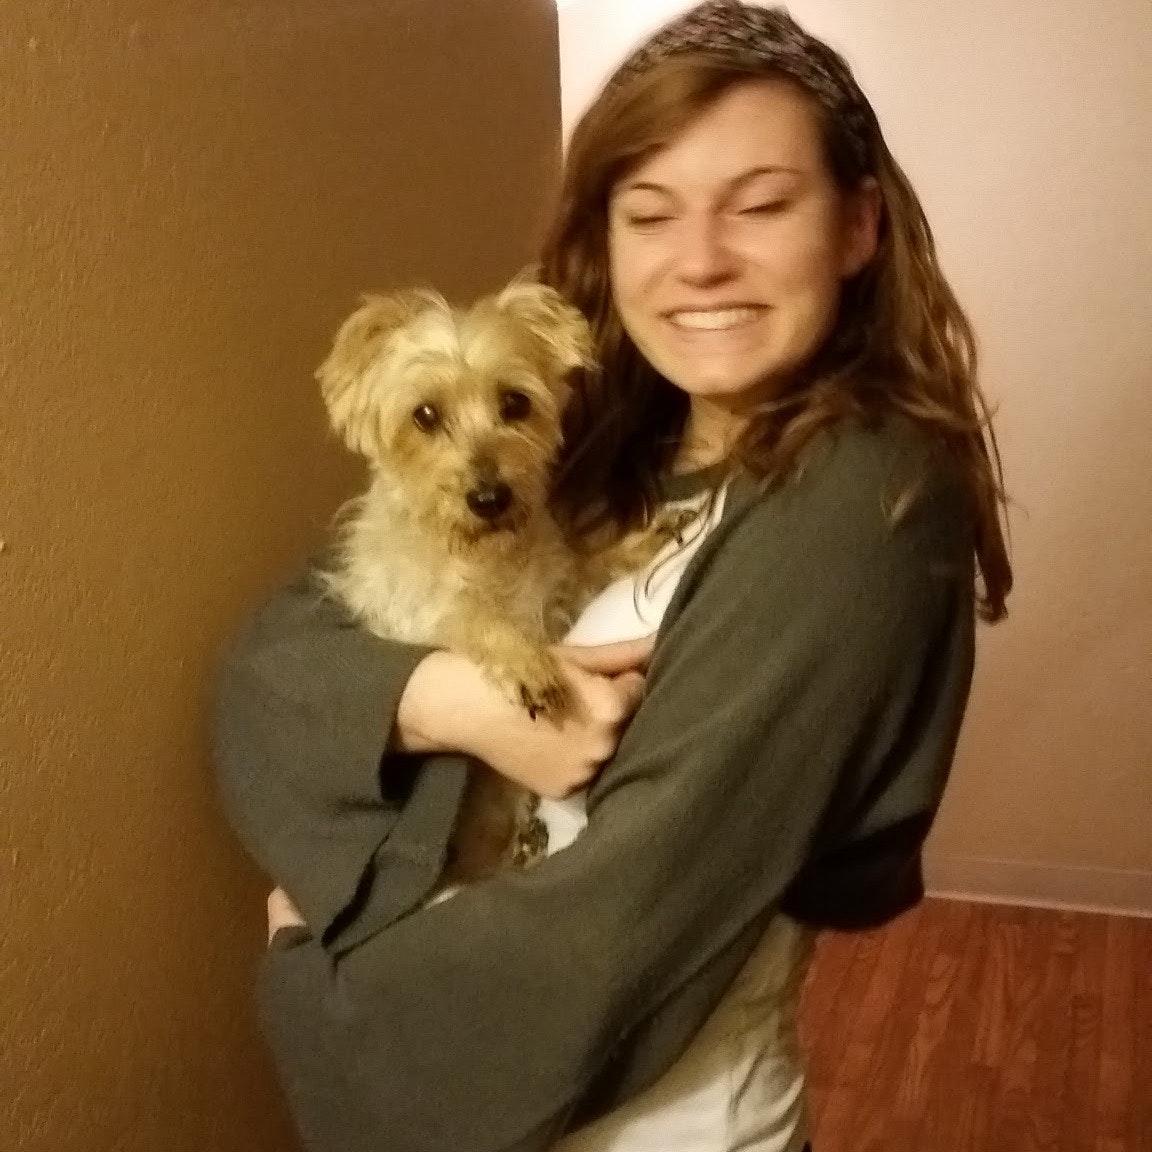 Kelly Jane's dog day care